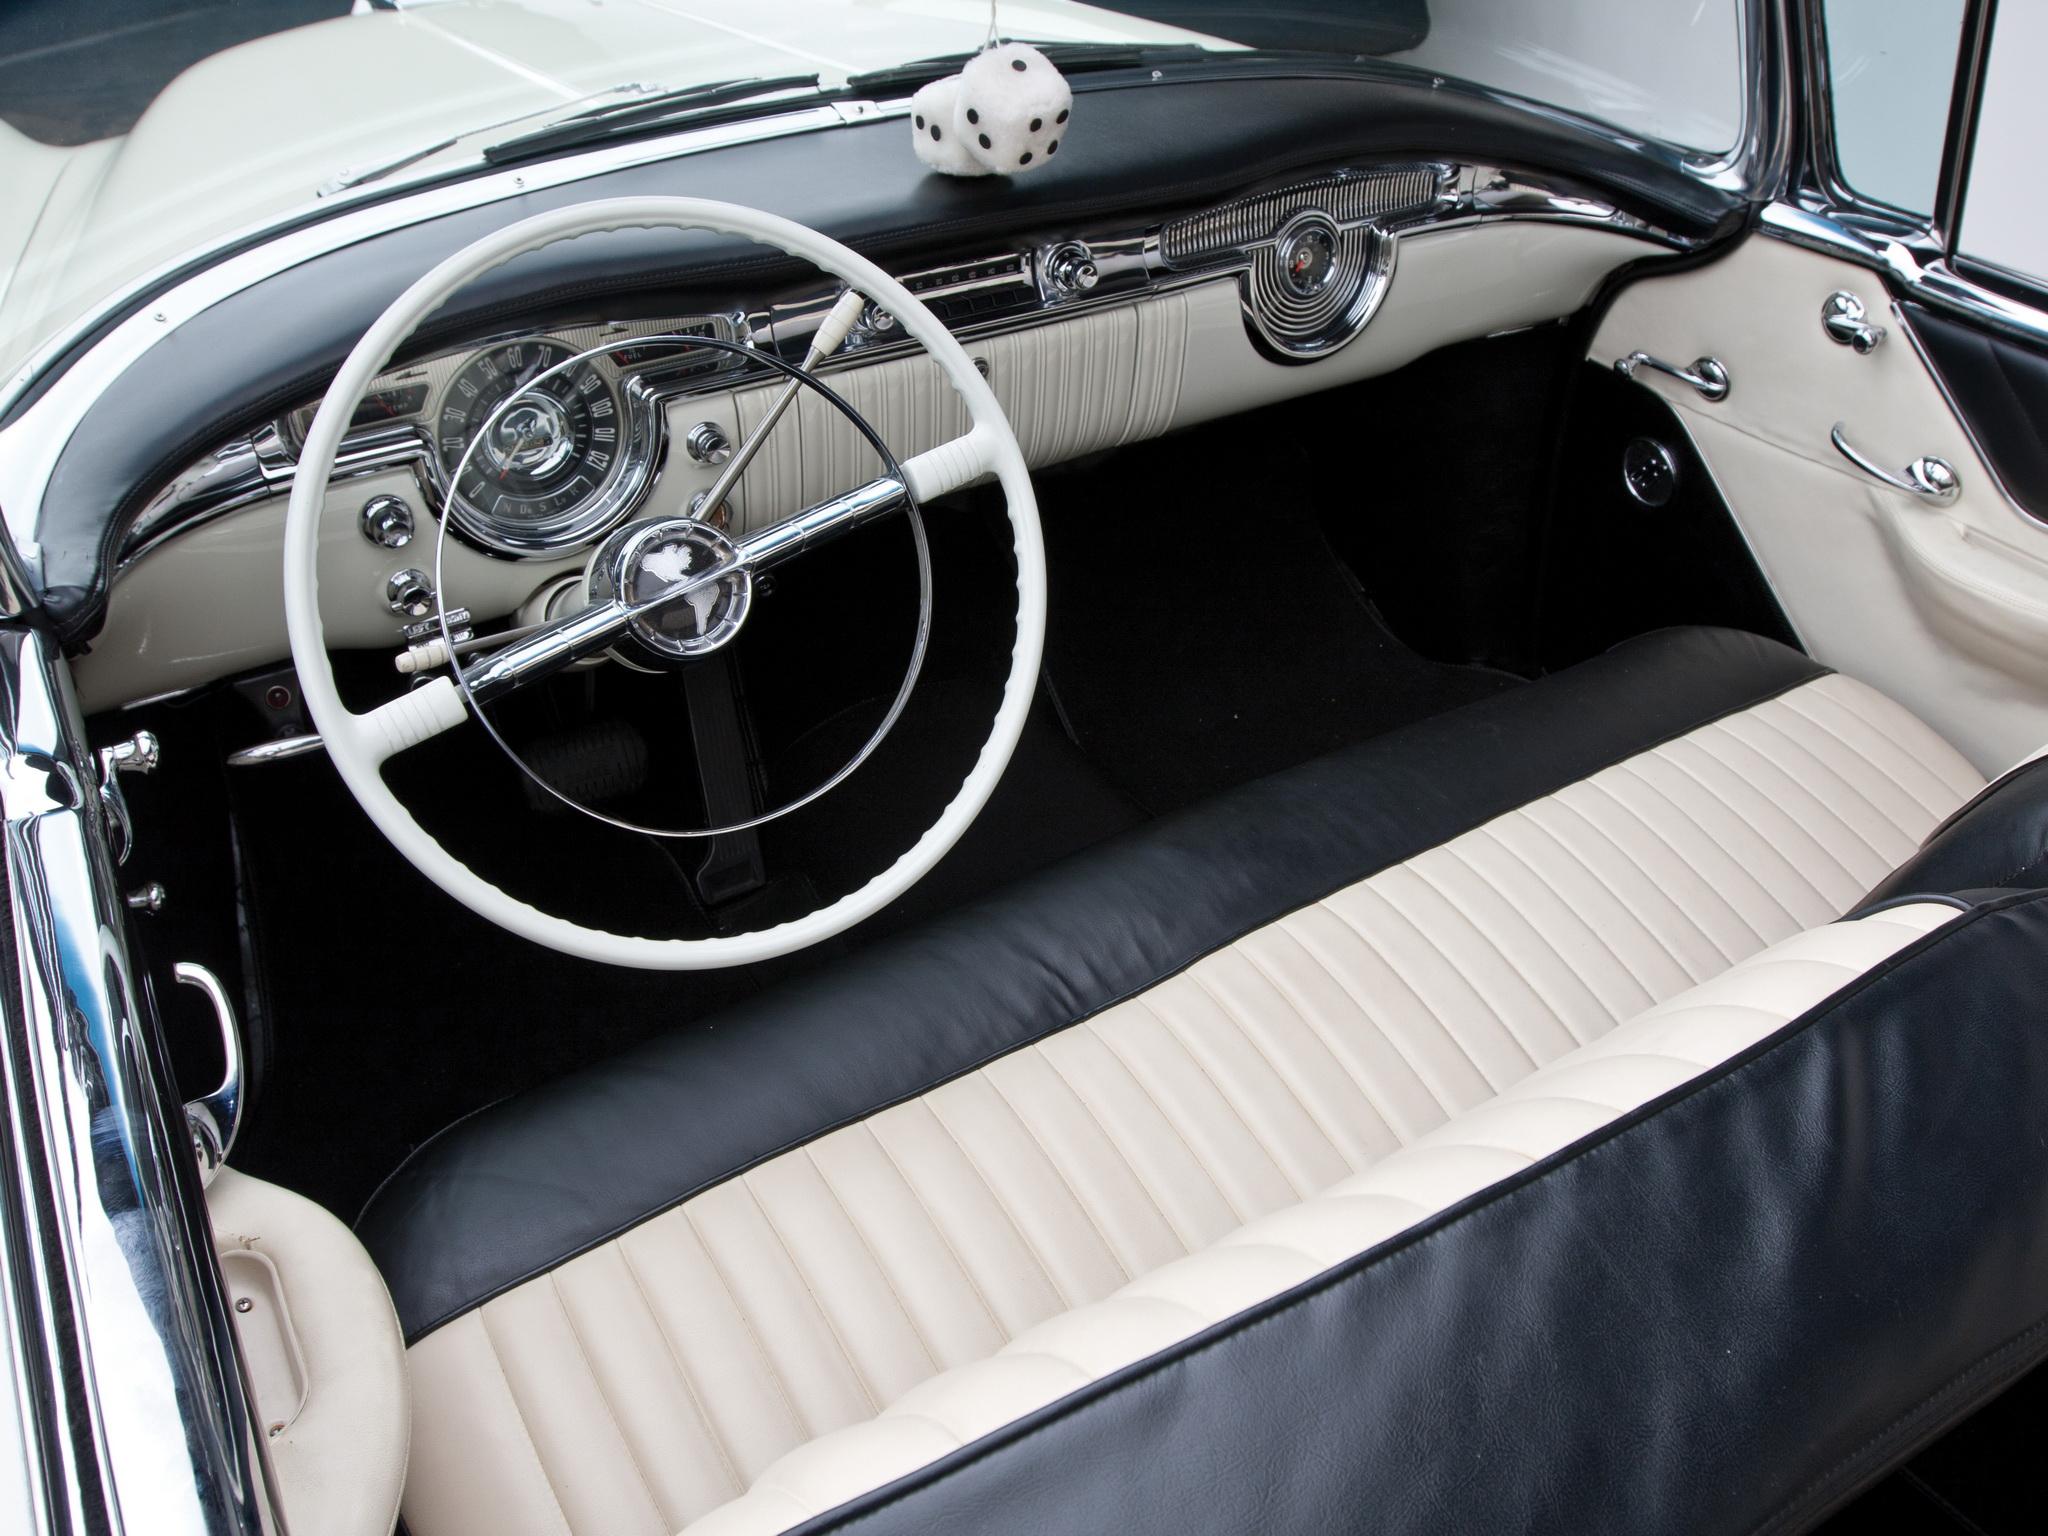 1955 oldsmobile super 88 convertible 3667dtx retro luxury 8 8 interior g wallpaper 2048x1536 164461 wallpaperup